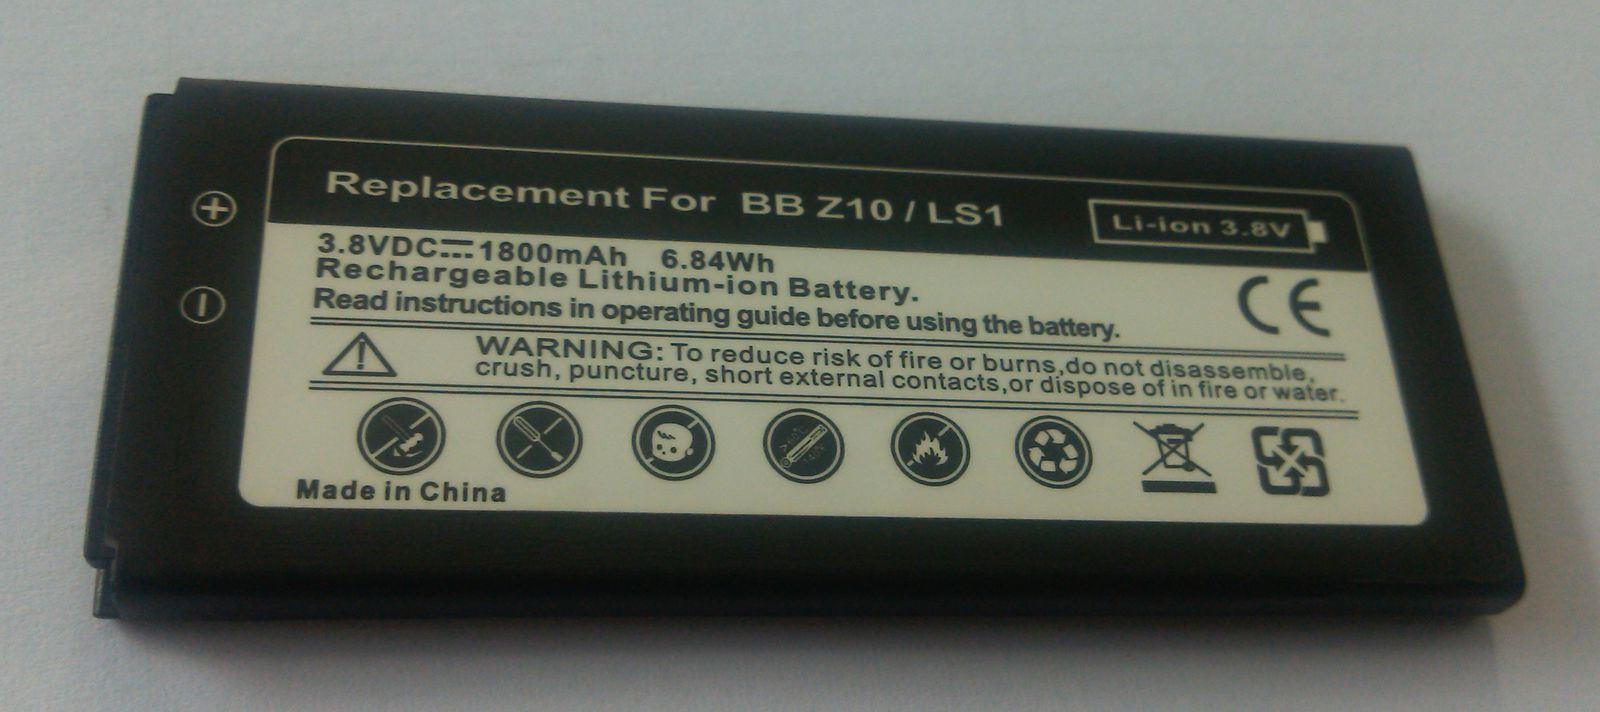 China Mobile Phone Battery for Blackberry Z10 - China Mobile Phone Battery, Cell Phone Battery